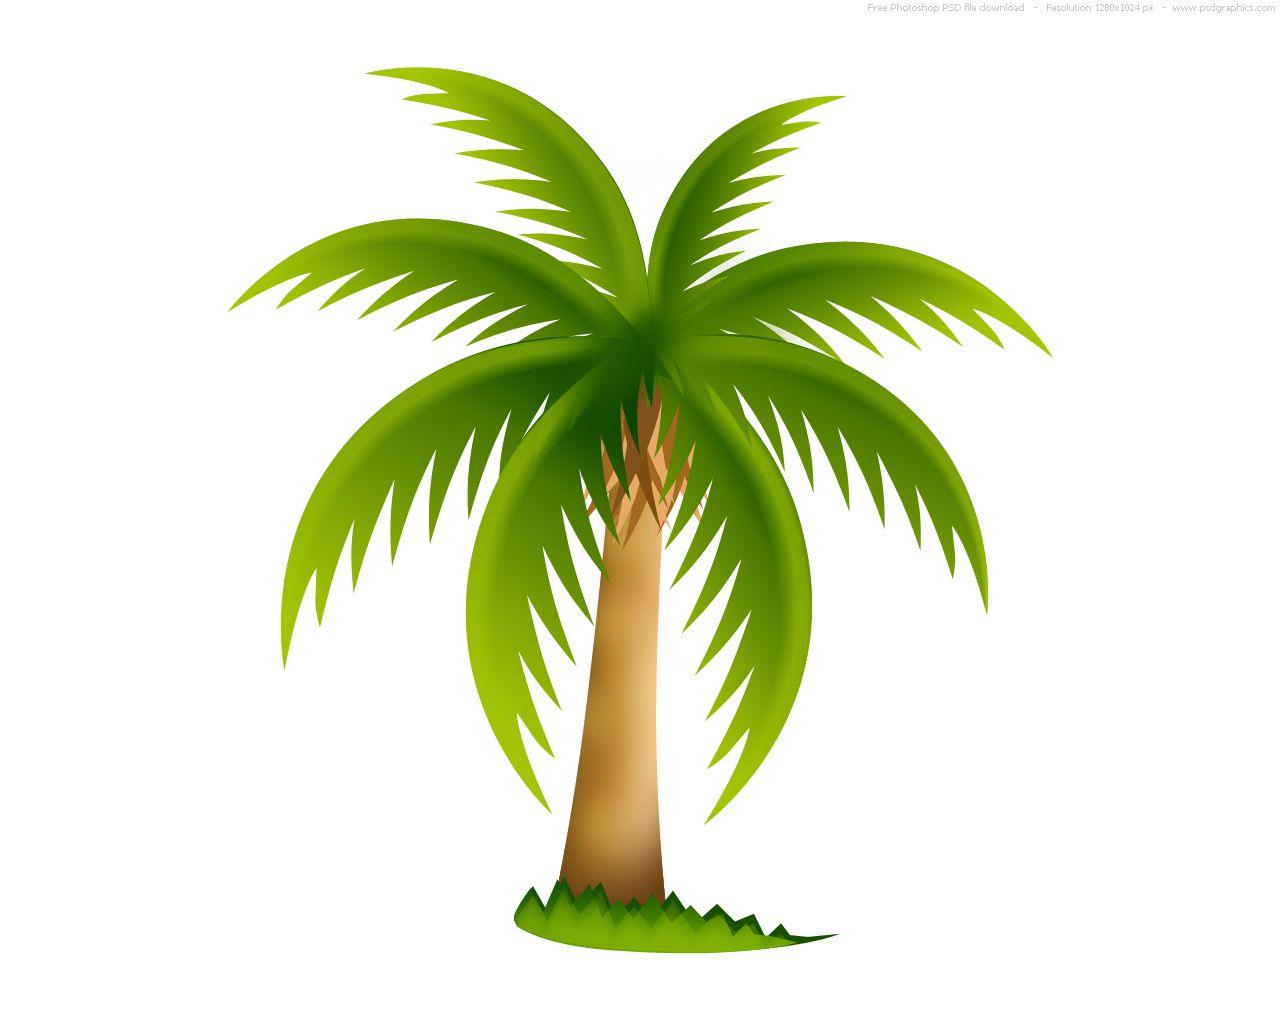 medium resolution of tree clipart palm tree image vector clip art online royalty free public domain